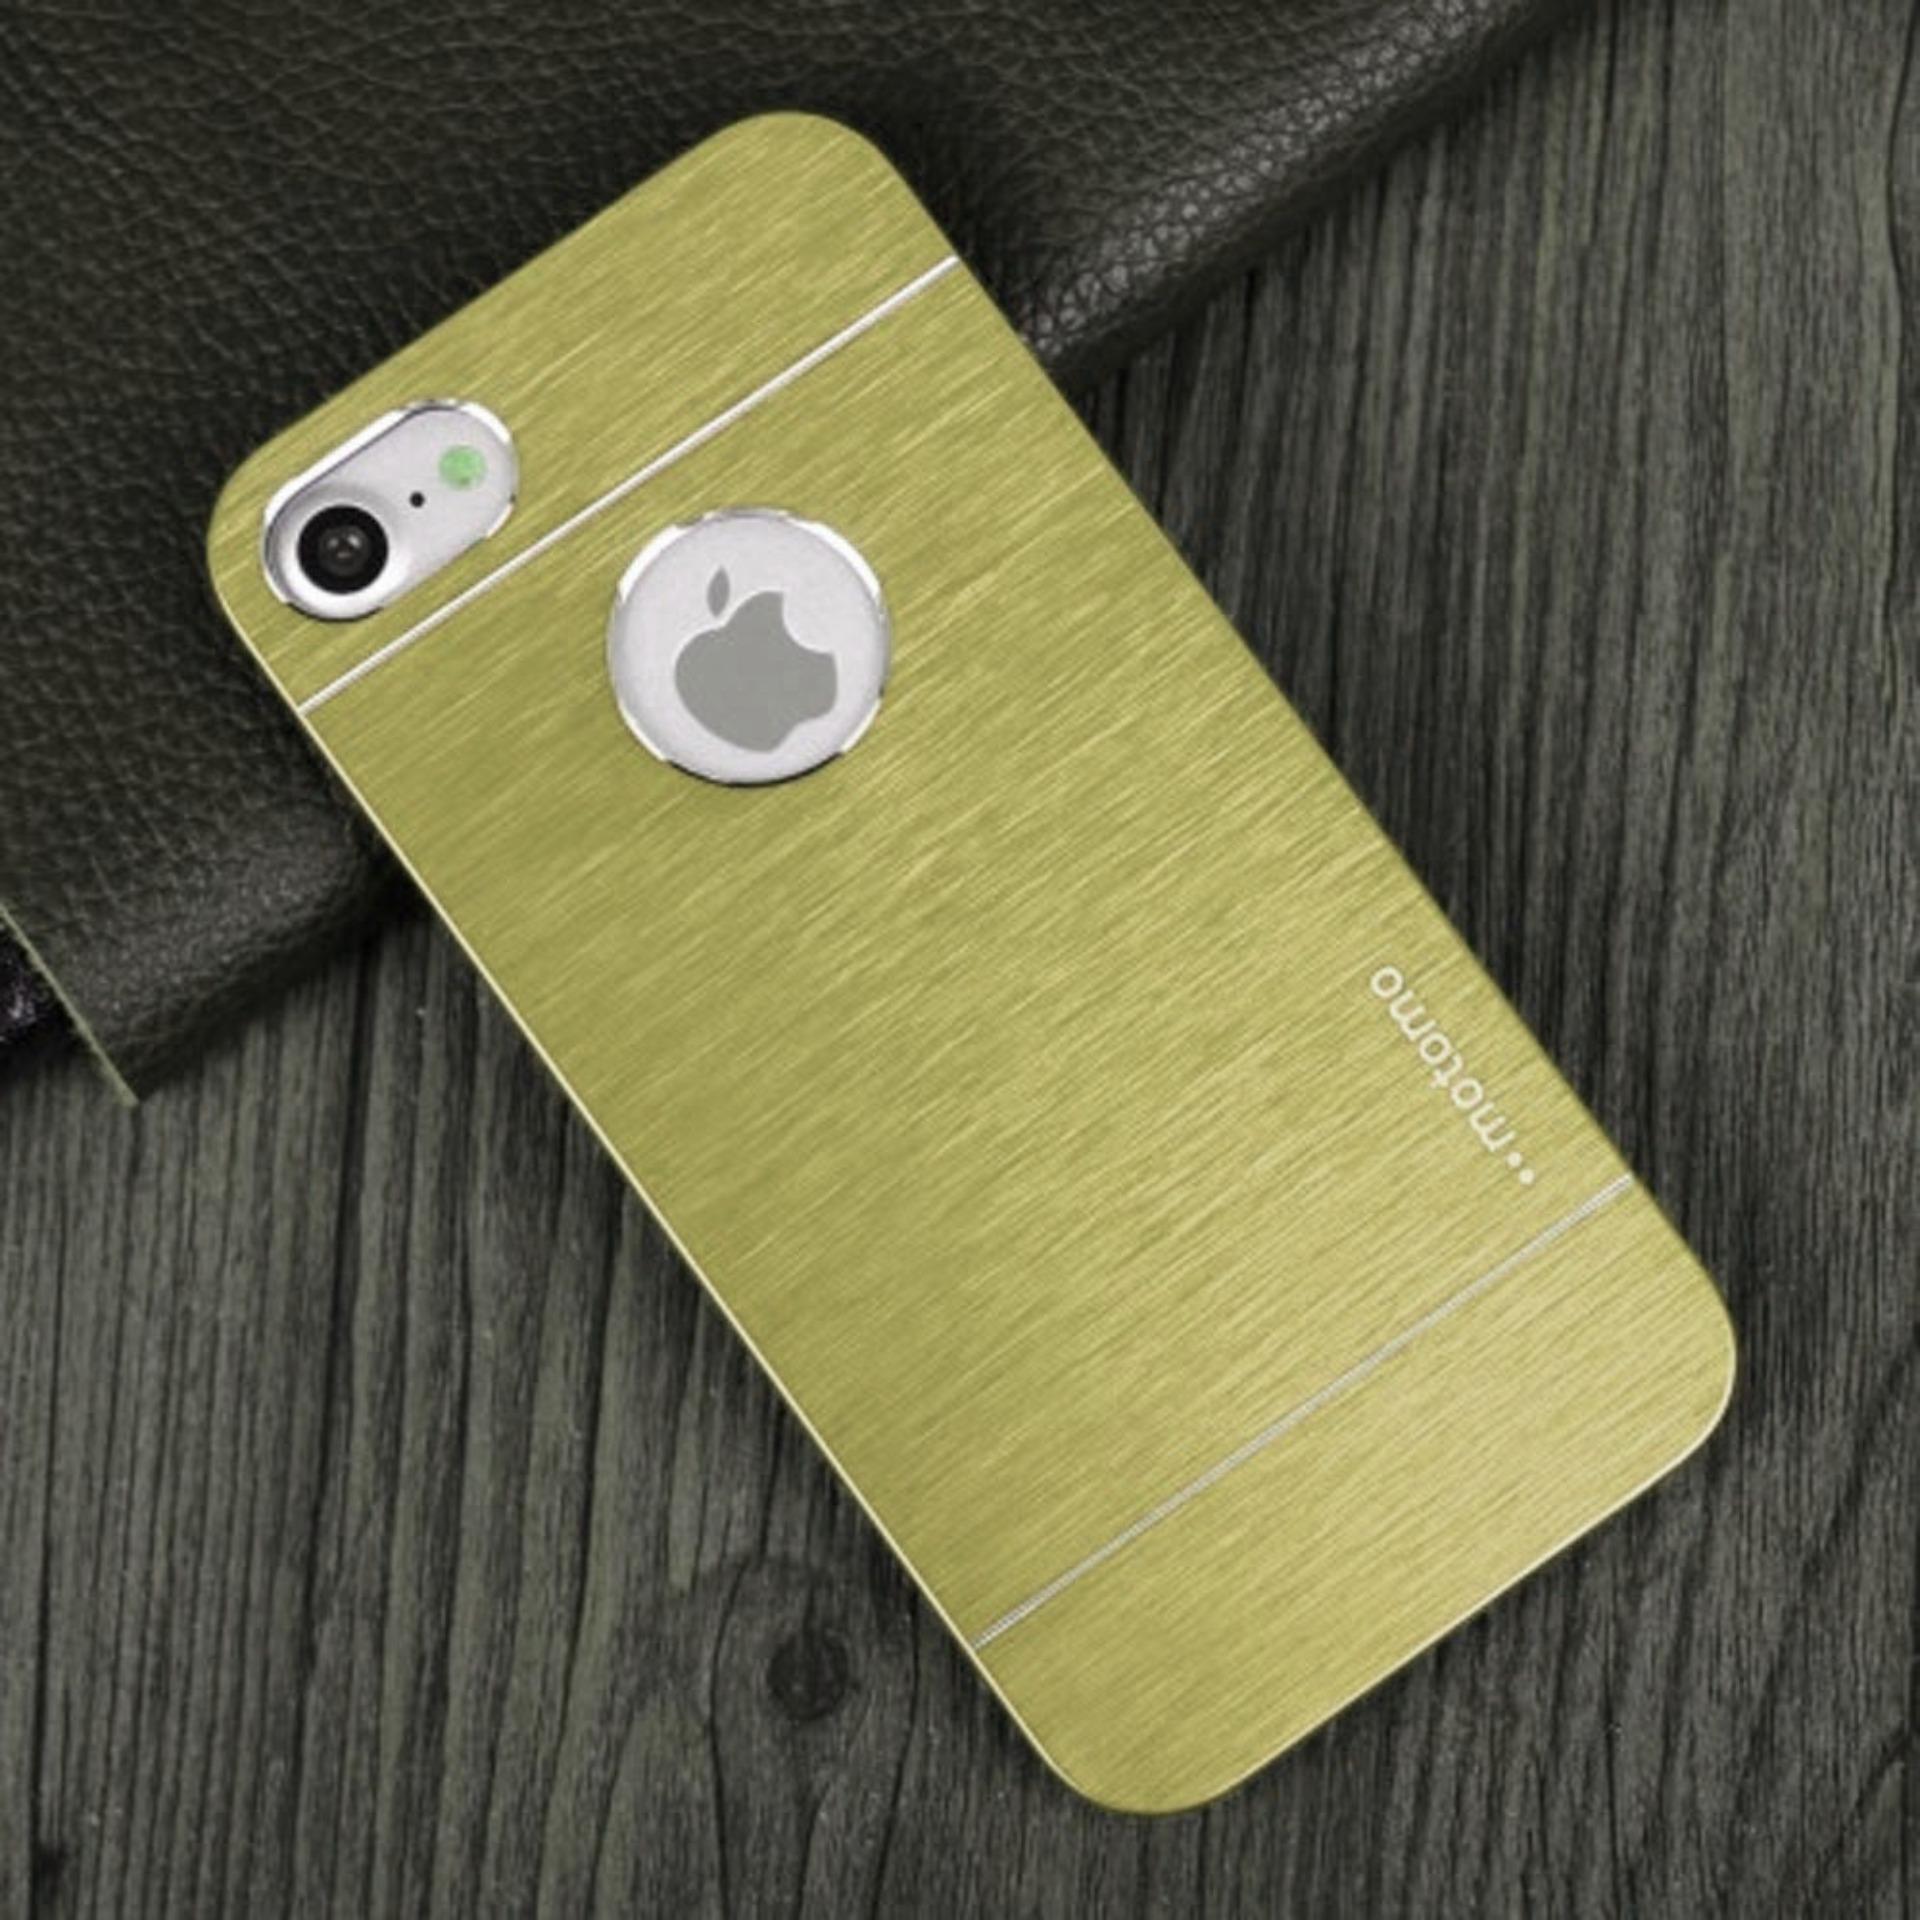 Motomo iPhone 5G/5S/SE Metal Hardcase / Hardcase Backcase / Metal Back Cover  - Gold